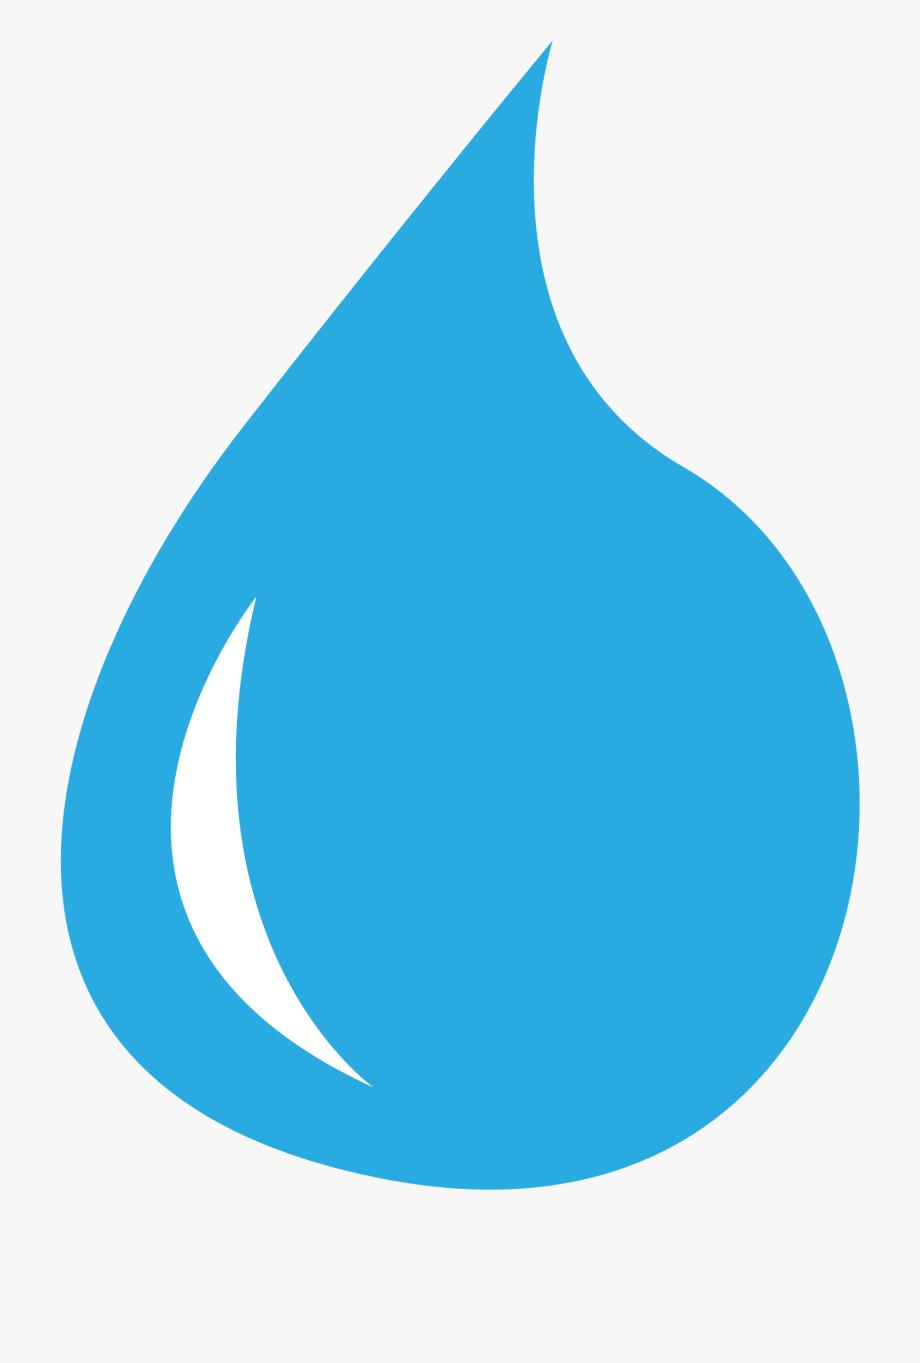 Water Drop Droplet Clipart Kid Transparent Png.